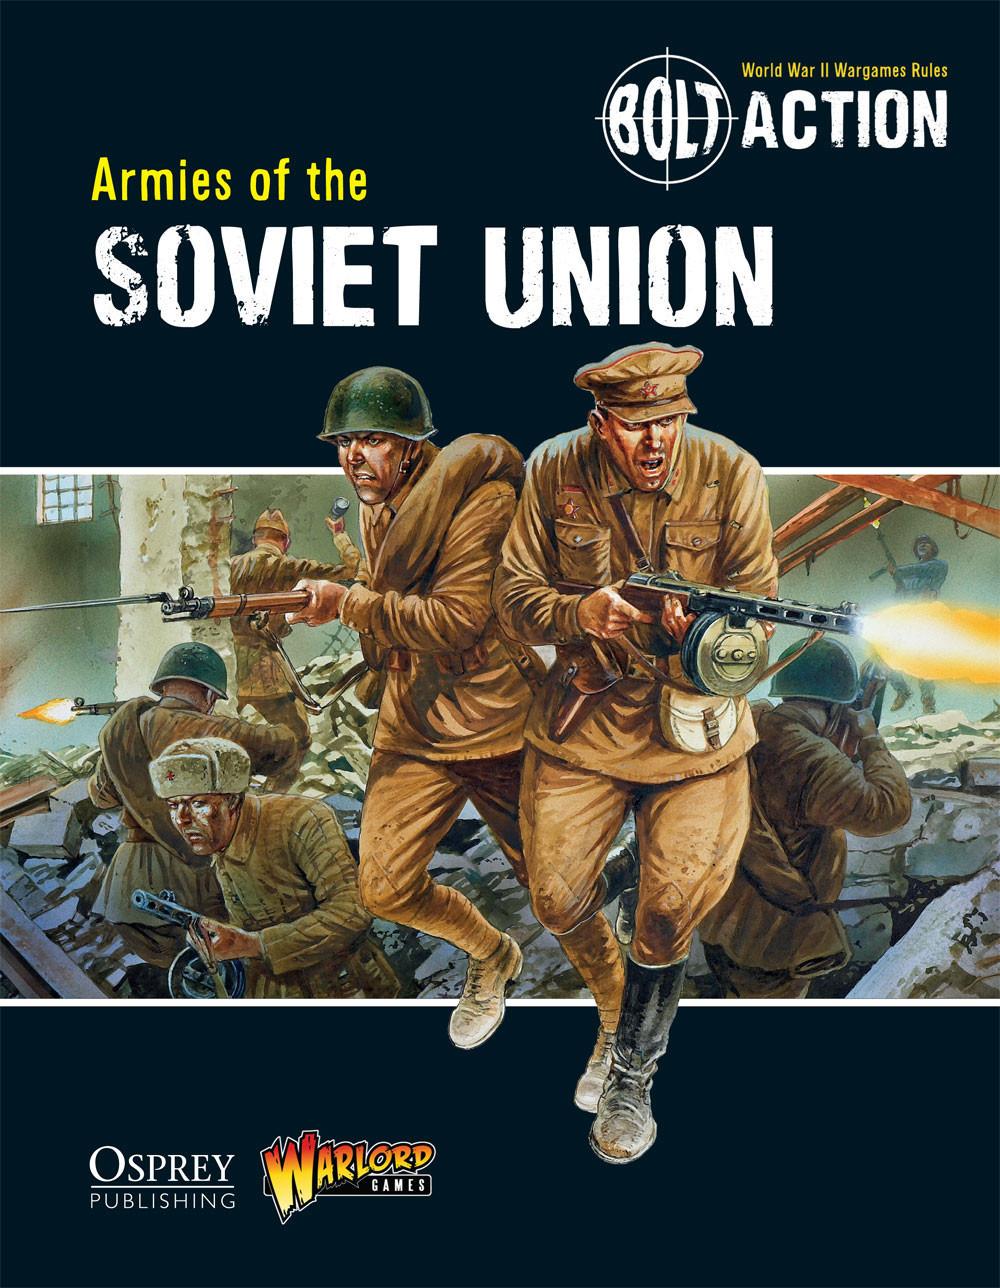 rp_armies-of-the-soviet-union_817a28f0-339f-4871-89b1-439088aae2d0.jpeg